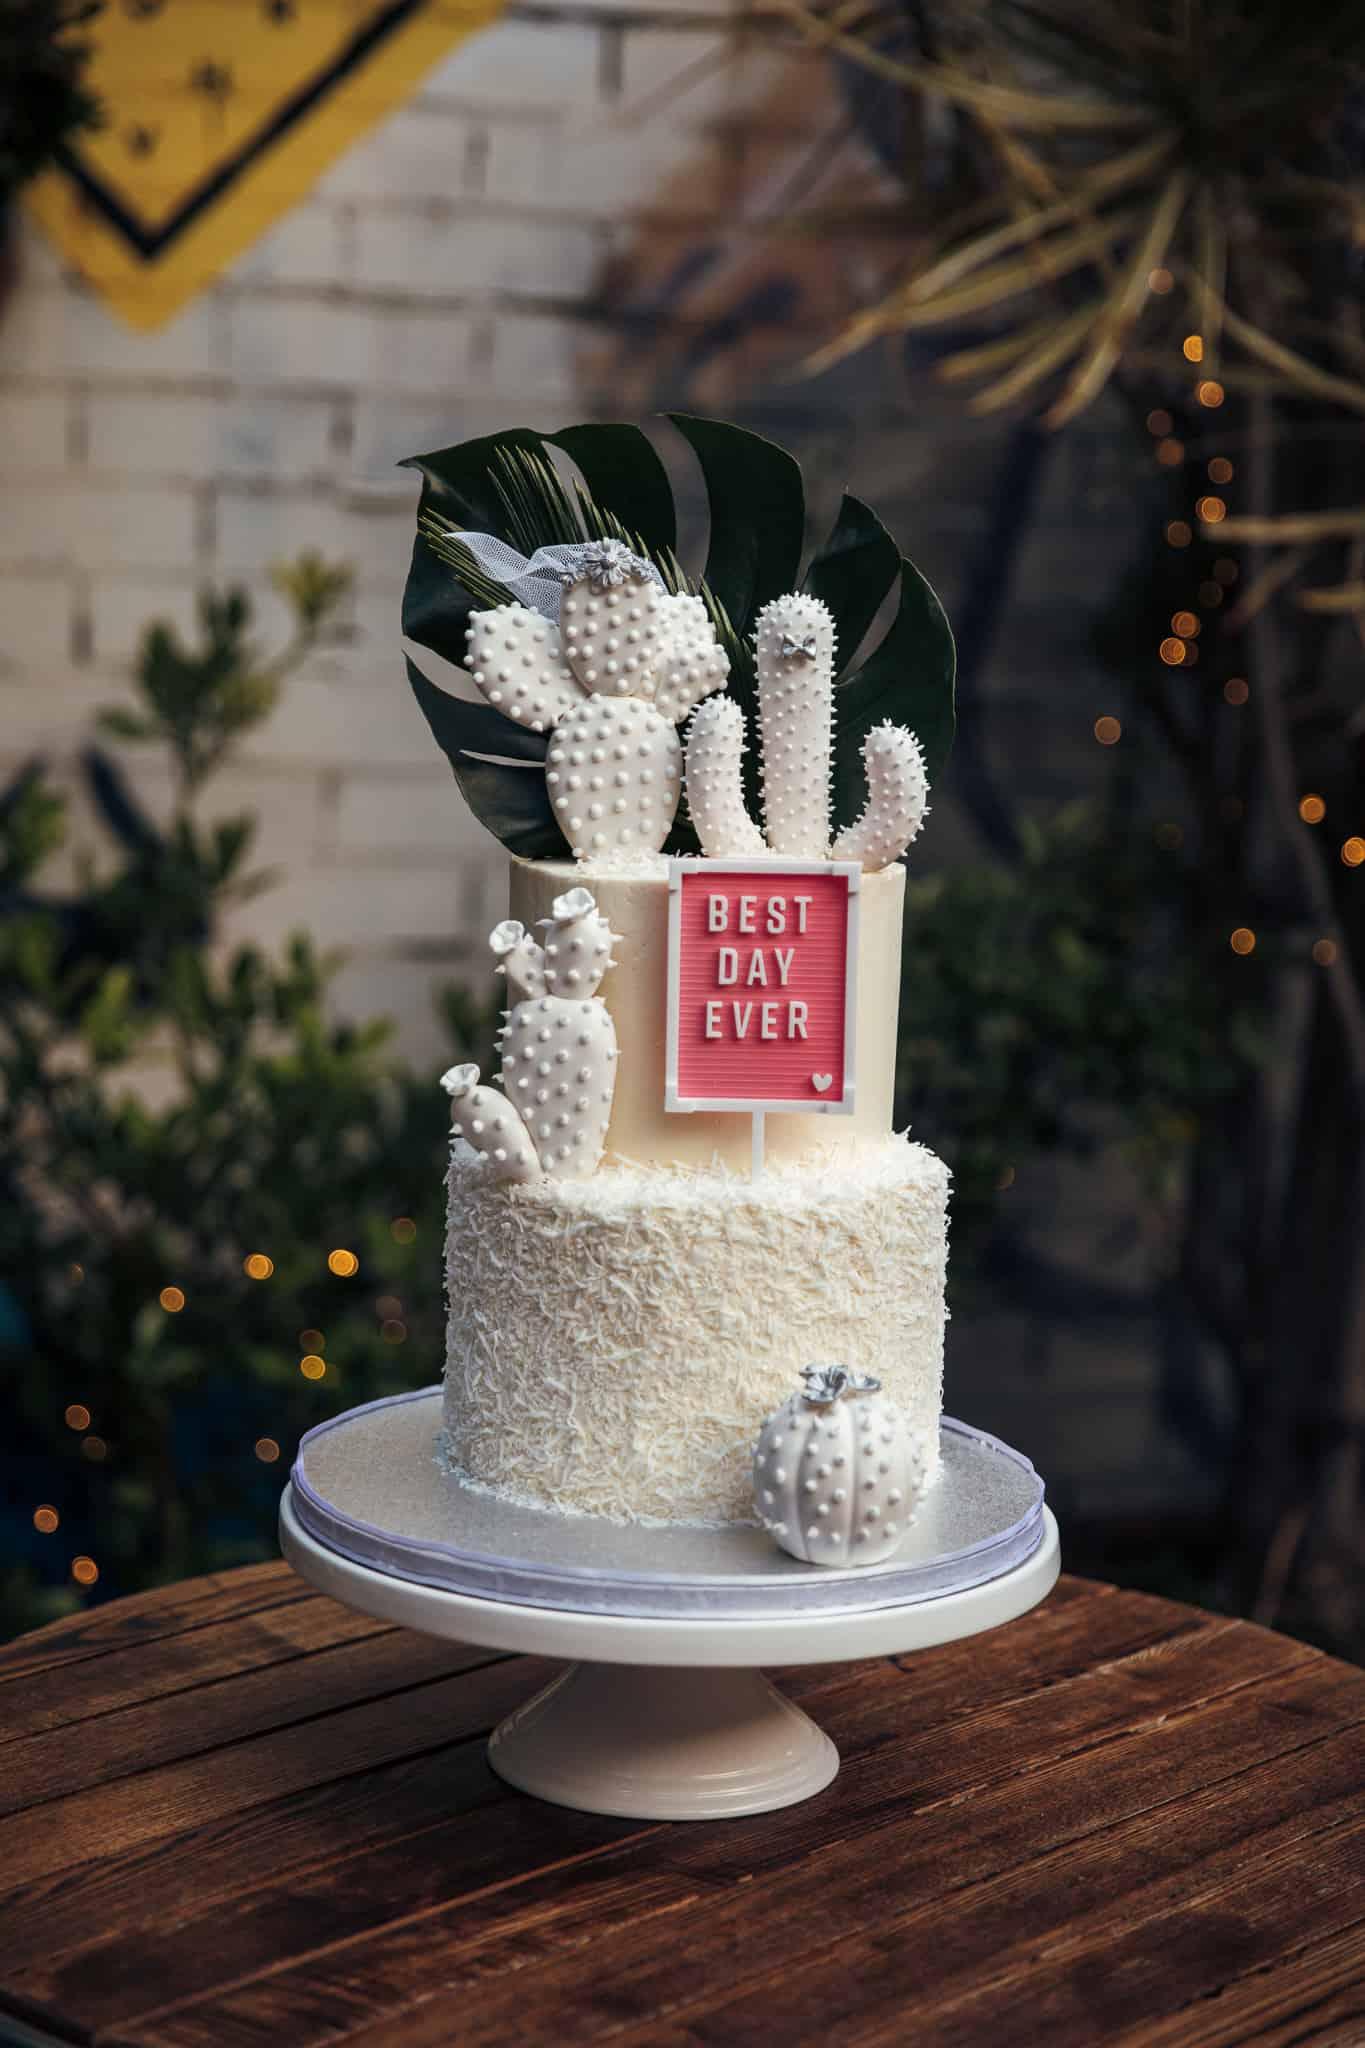 best wedding cakes of 2019 - cactus cake